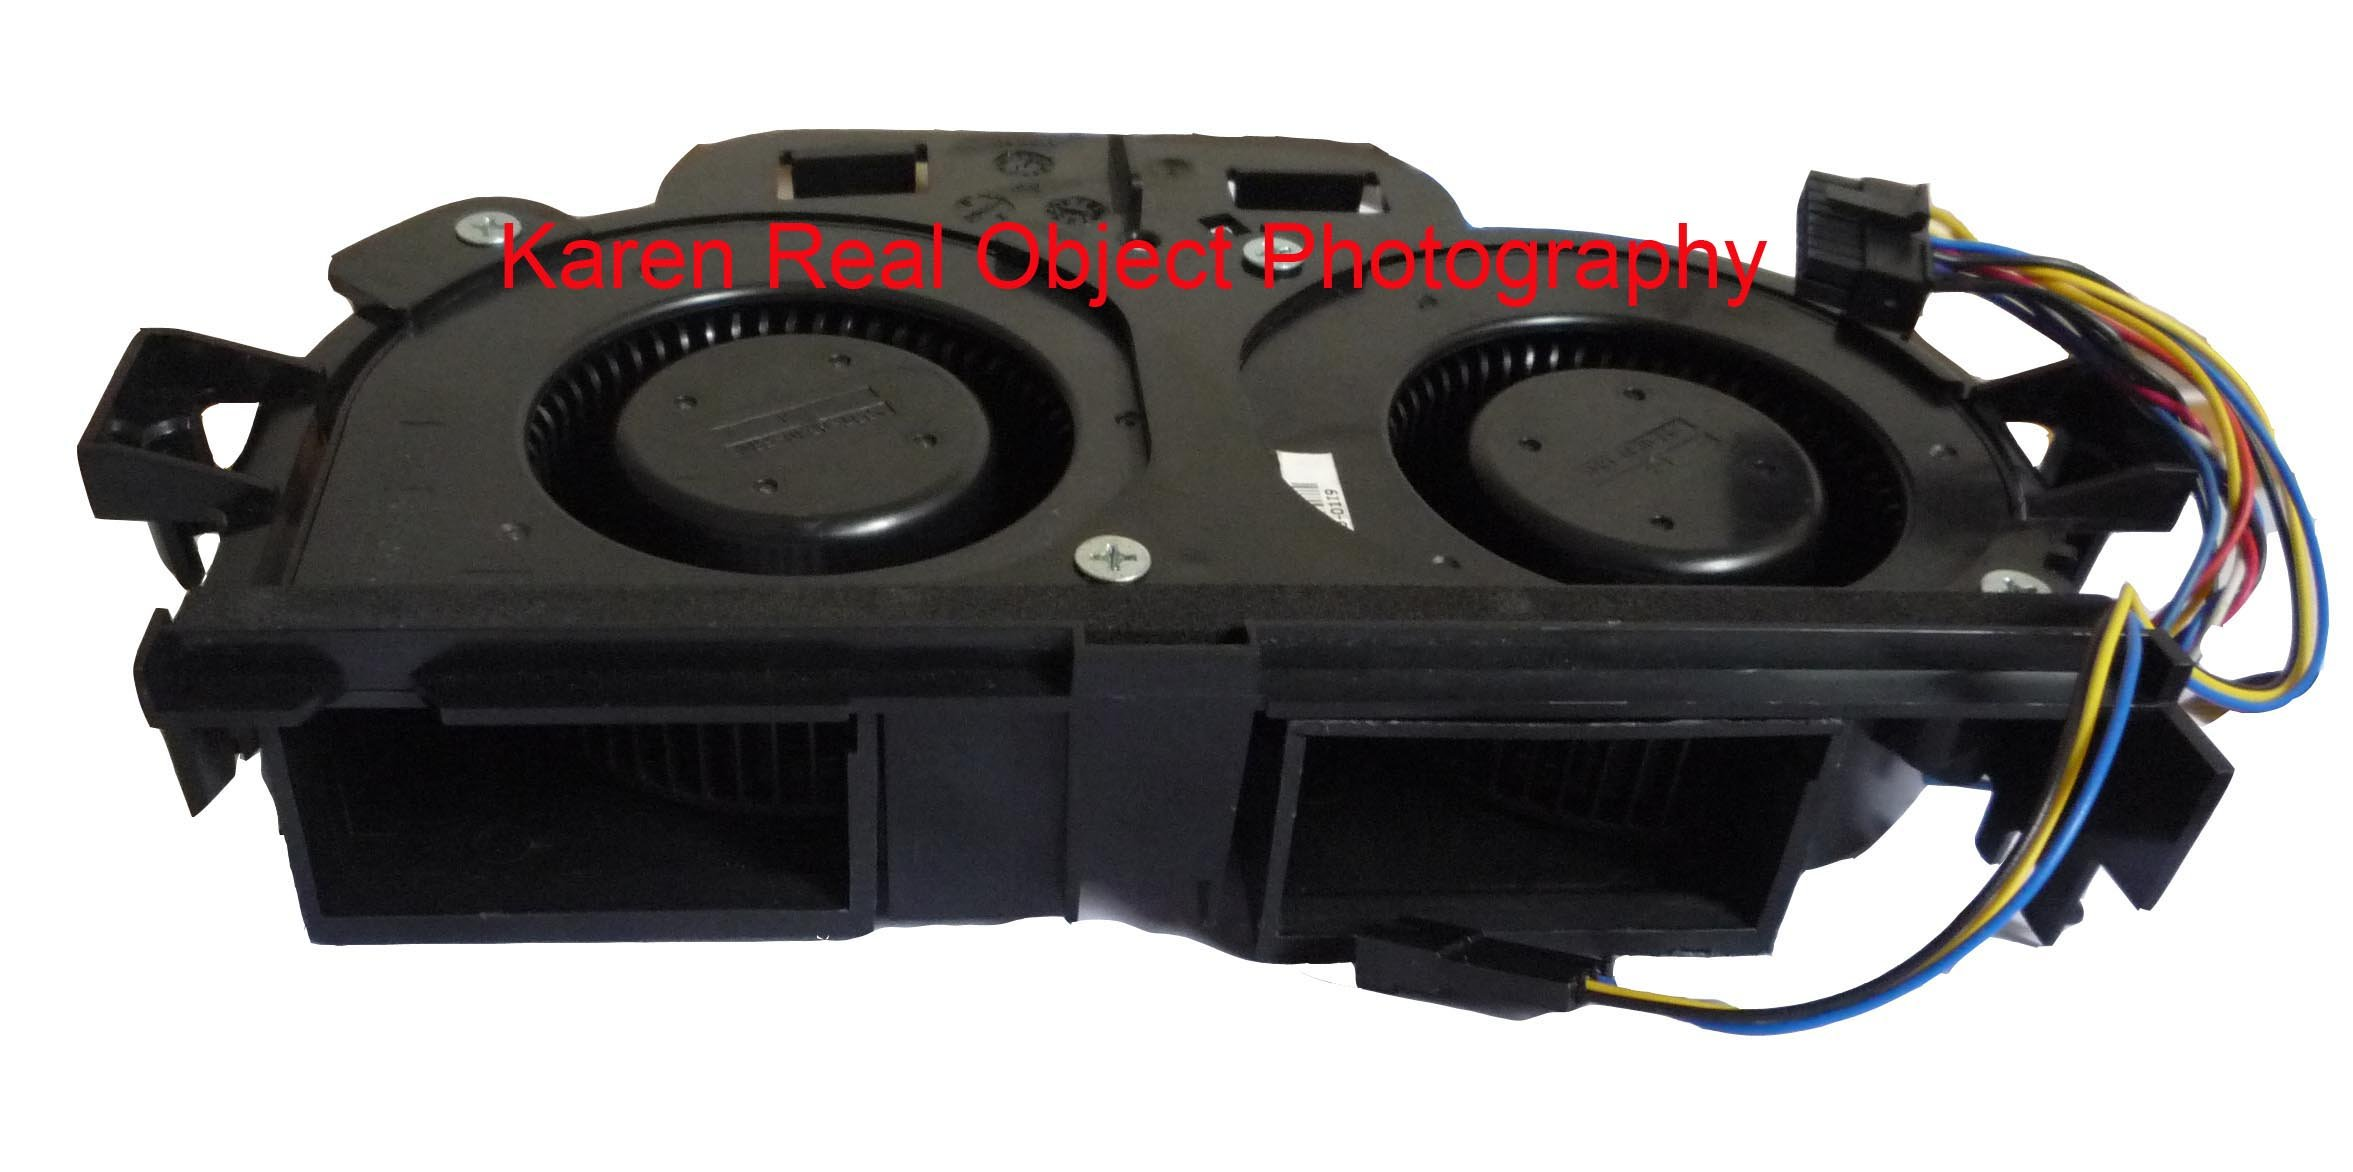 NMB 97*94*33mm BG0903-B049-POS 12V 2.65A Blower Cooling Fan 1set(2pcs) nmb 3610kl 05w b49 9225 24v 3 wire cooling fan blower